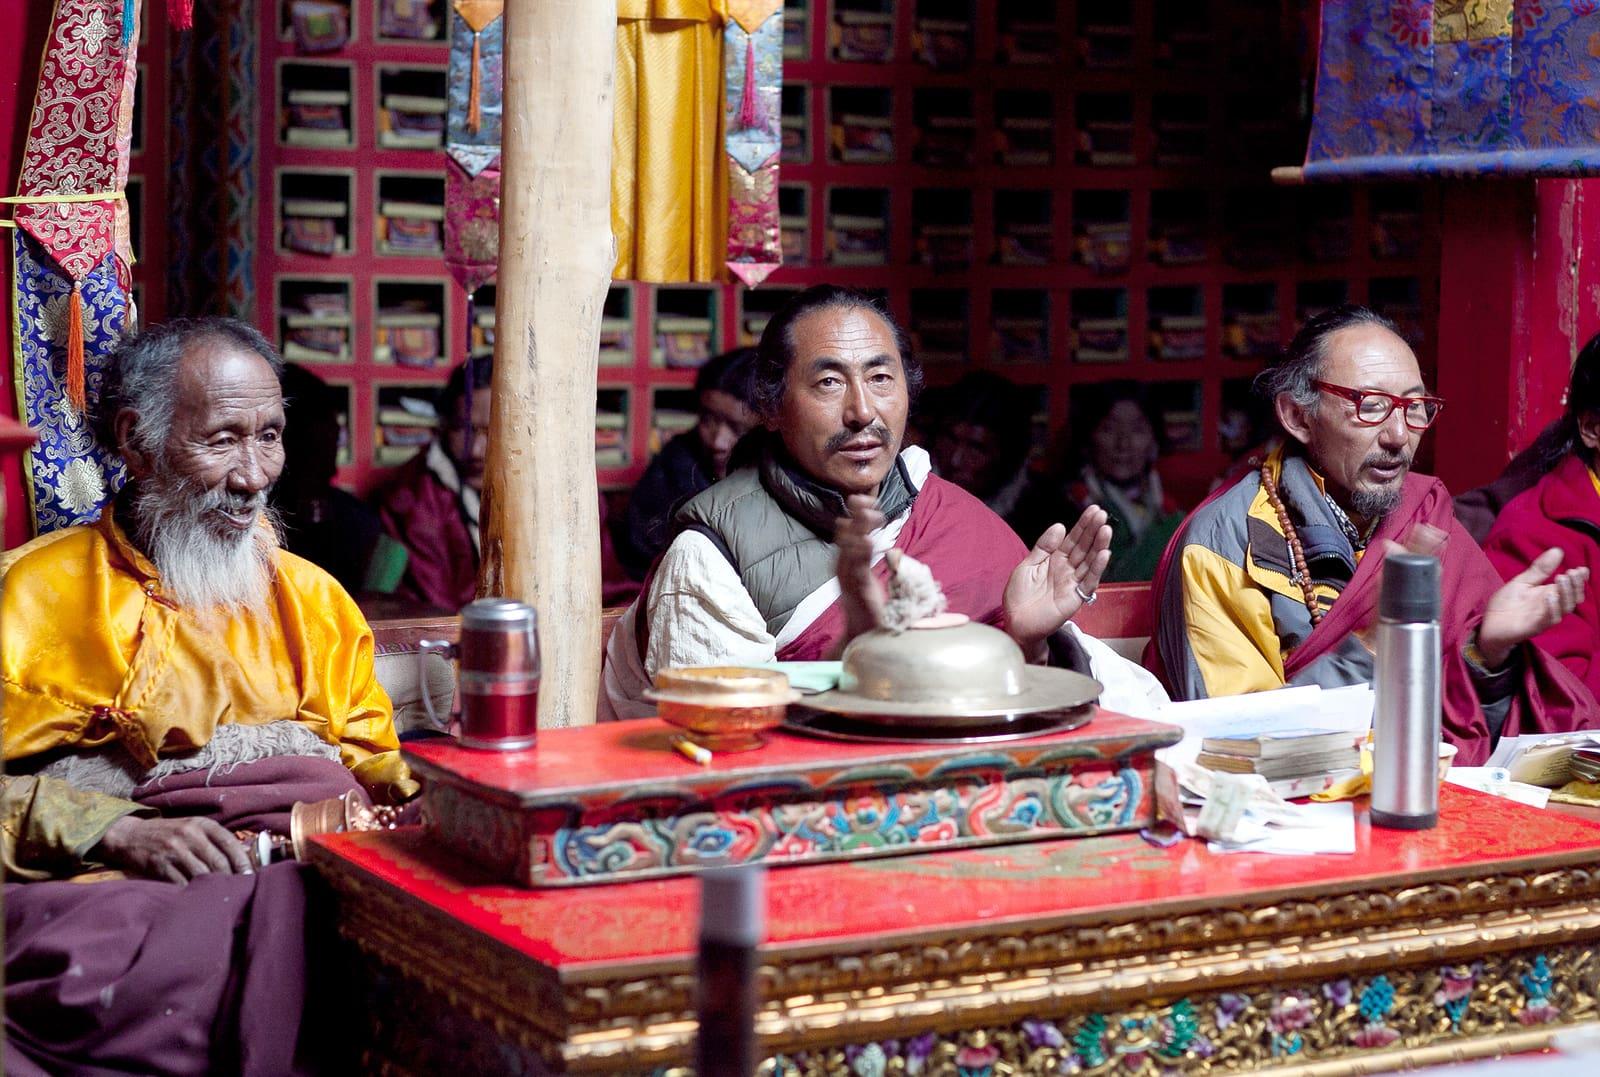 Tibetan Buddhist monks in Chiu monastery in Western Tibet